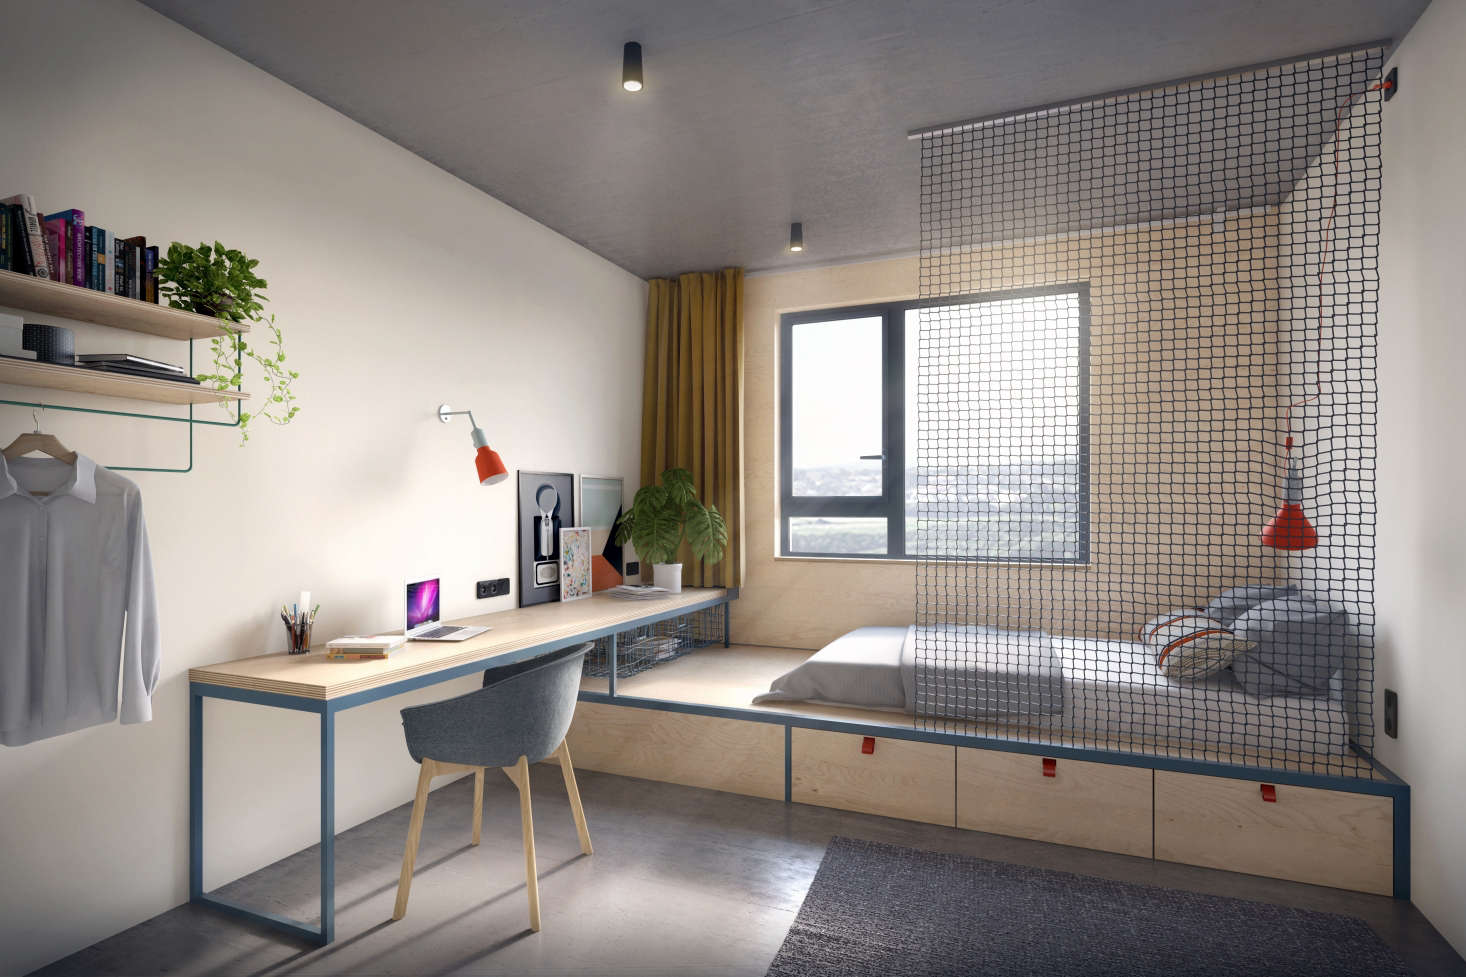 Designer dorm rooms: stylish student housing and hostel ...